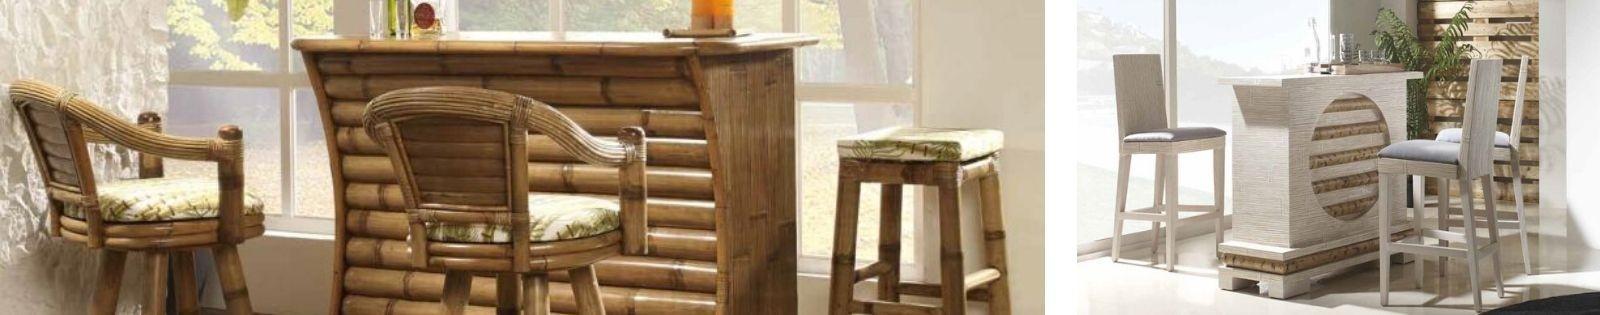 Bar en bambou : Meubles haut de gamme de fabrication artisanale